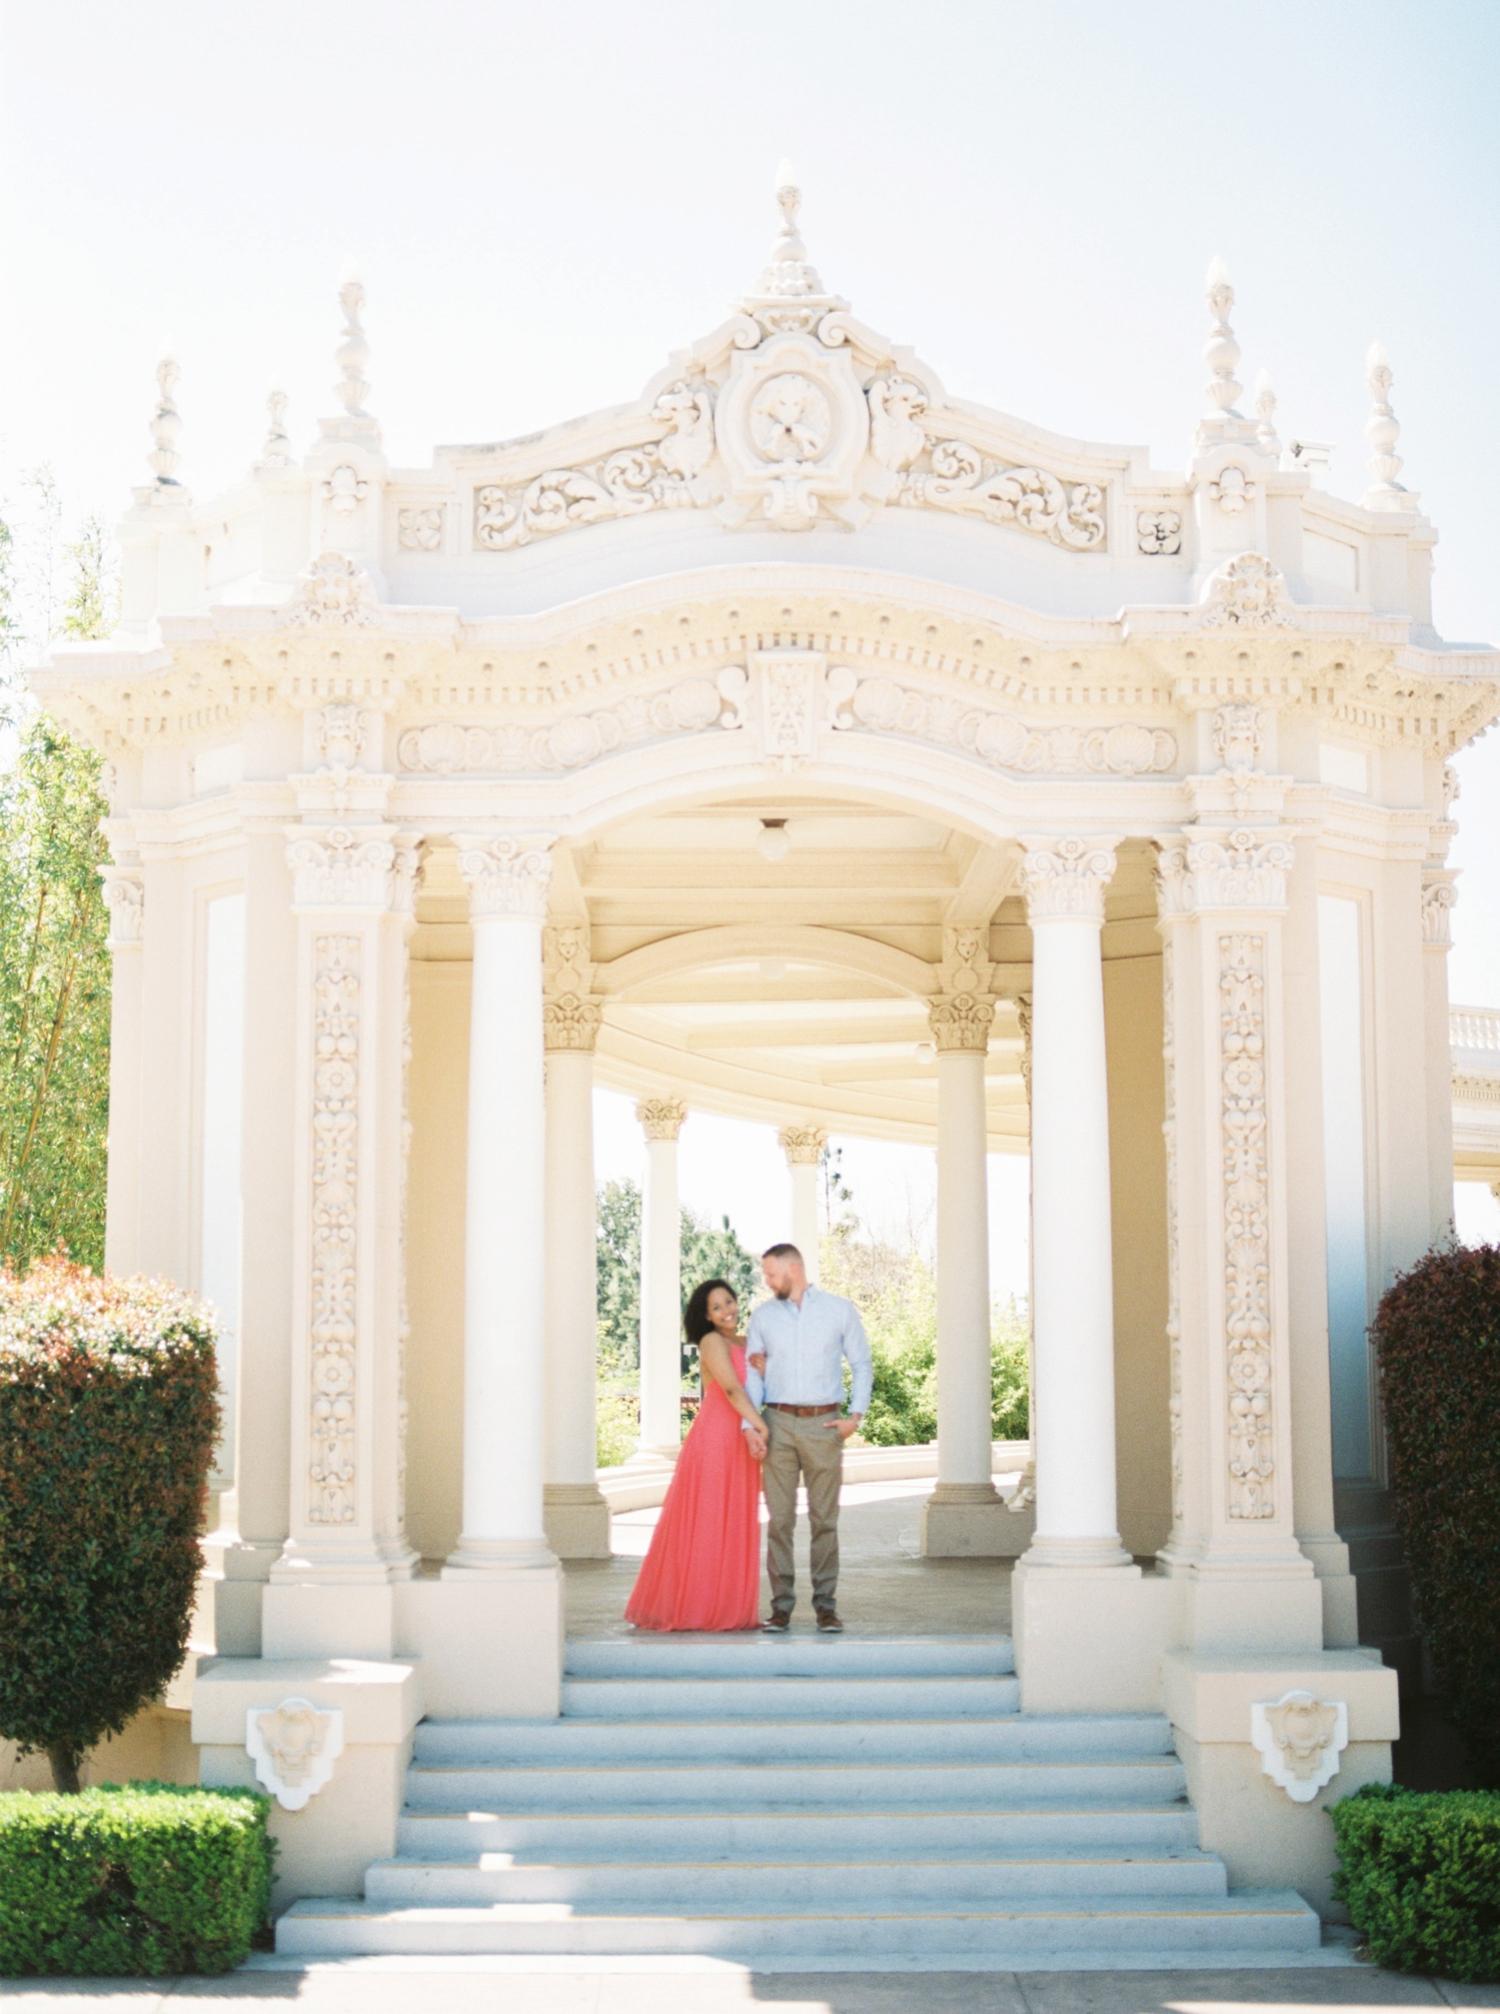 San-Diego-California-Beautiful-Film-Engagement-Wedding-Photographer-Balboa-Park-Sunset-Cliffs-Wedding-Photos_5189.jpg